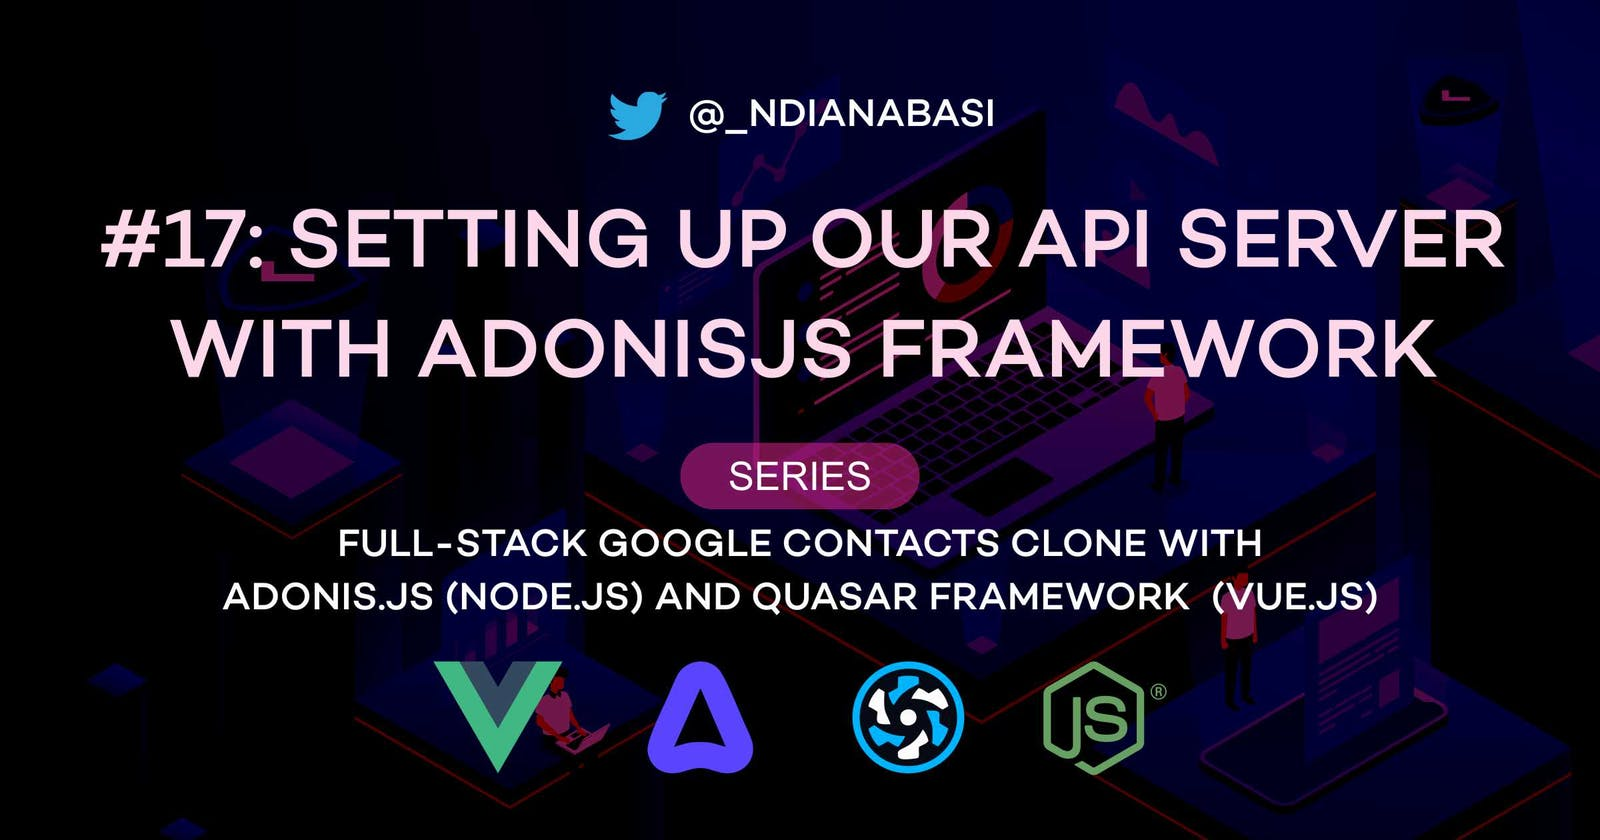 Setting Up Our API Server with AdonisJs Framework   Full-Stack Google Contacts Clone with AdonisJs (Node.js) and Quasar Framework (Vue.js)